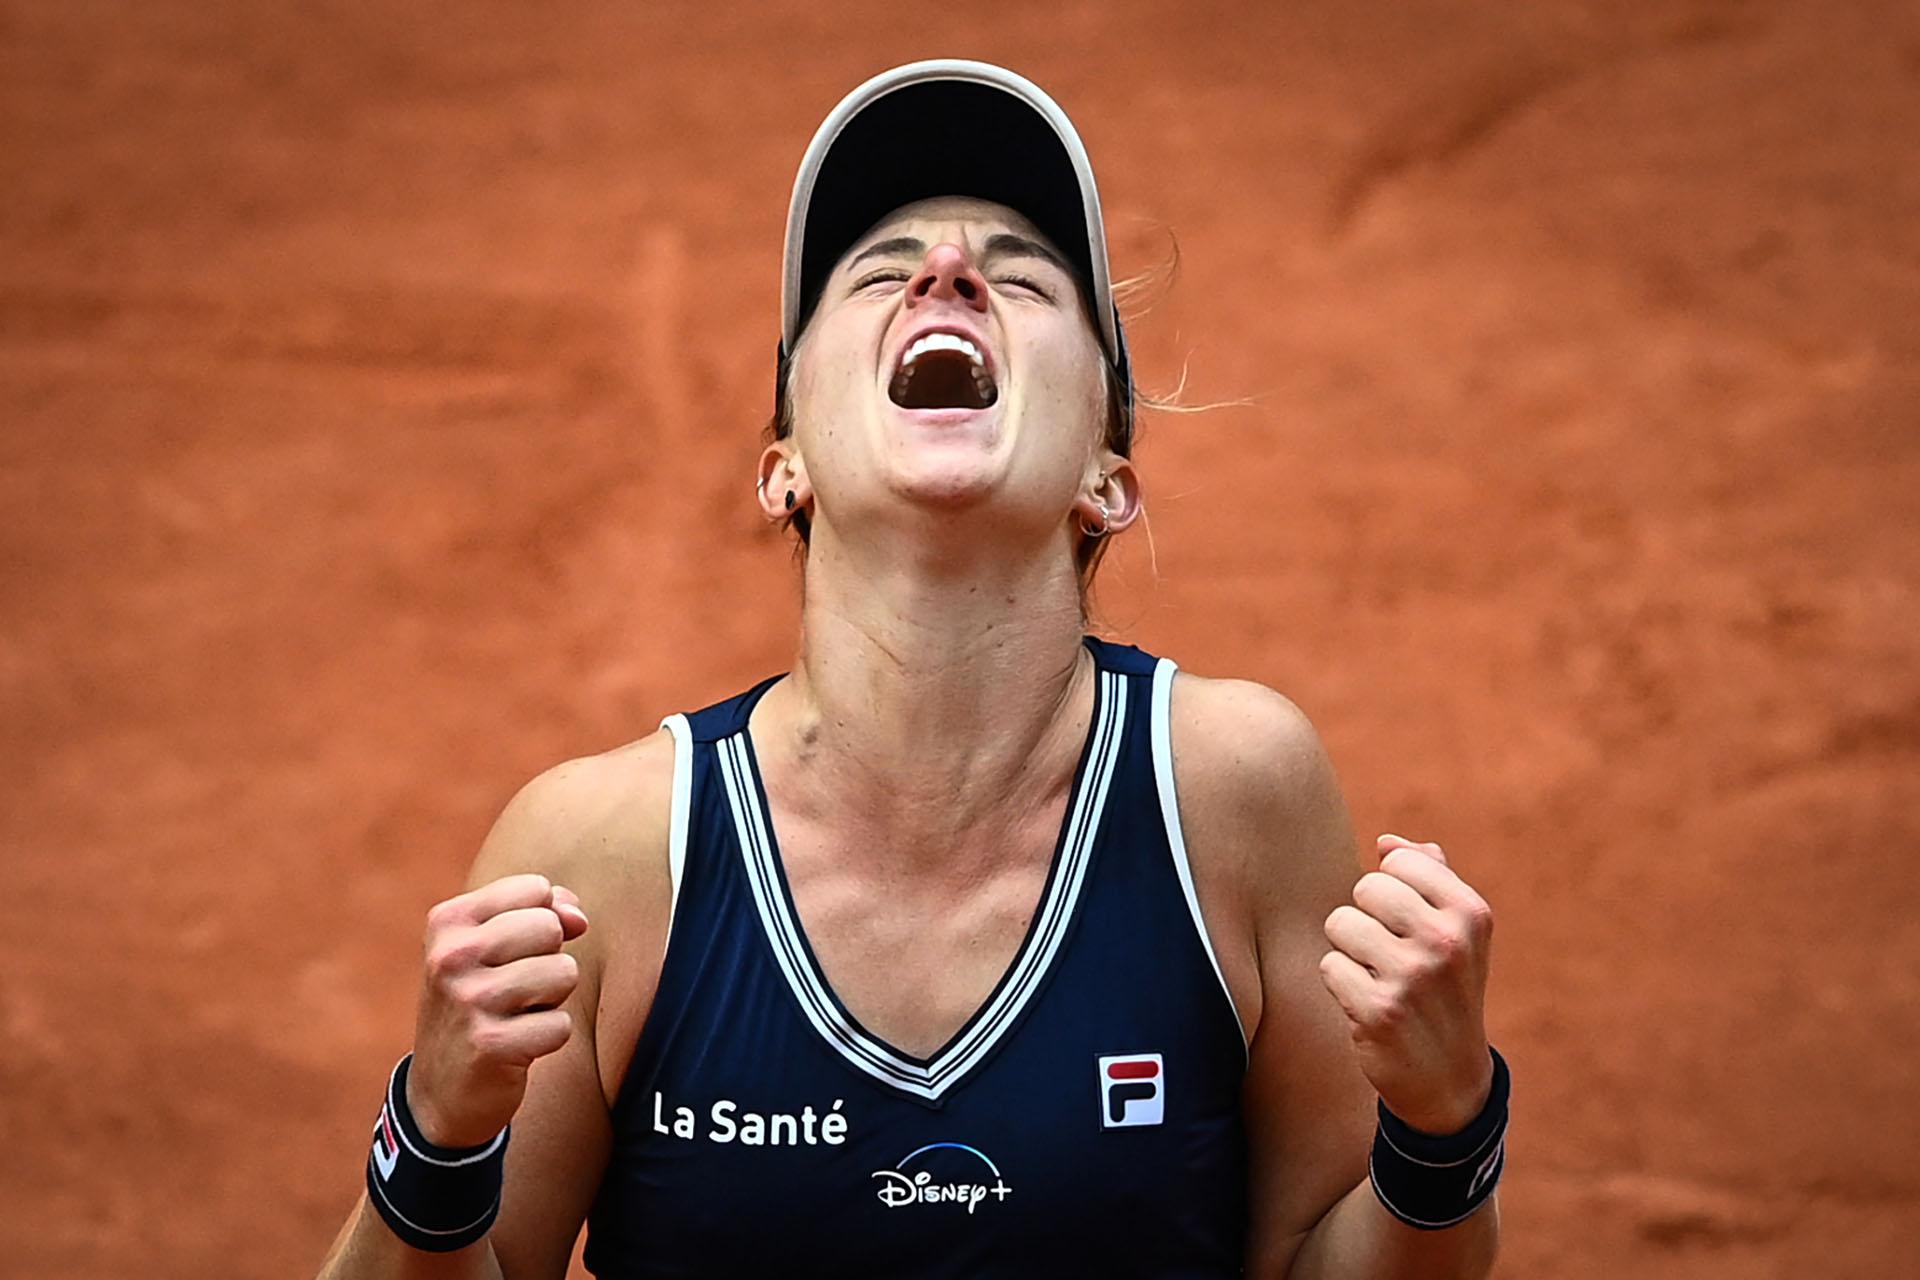 Un grito inolvidable para la tenista rosarina en Francia (Photo by Anne-Christine POUJOULAT / AFP)